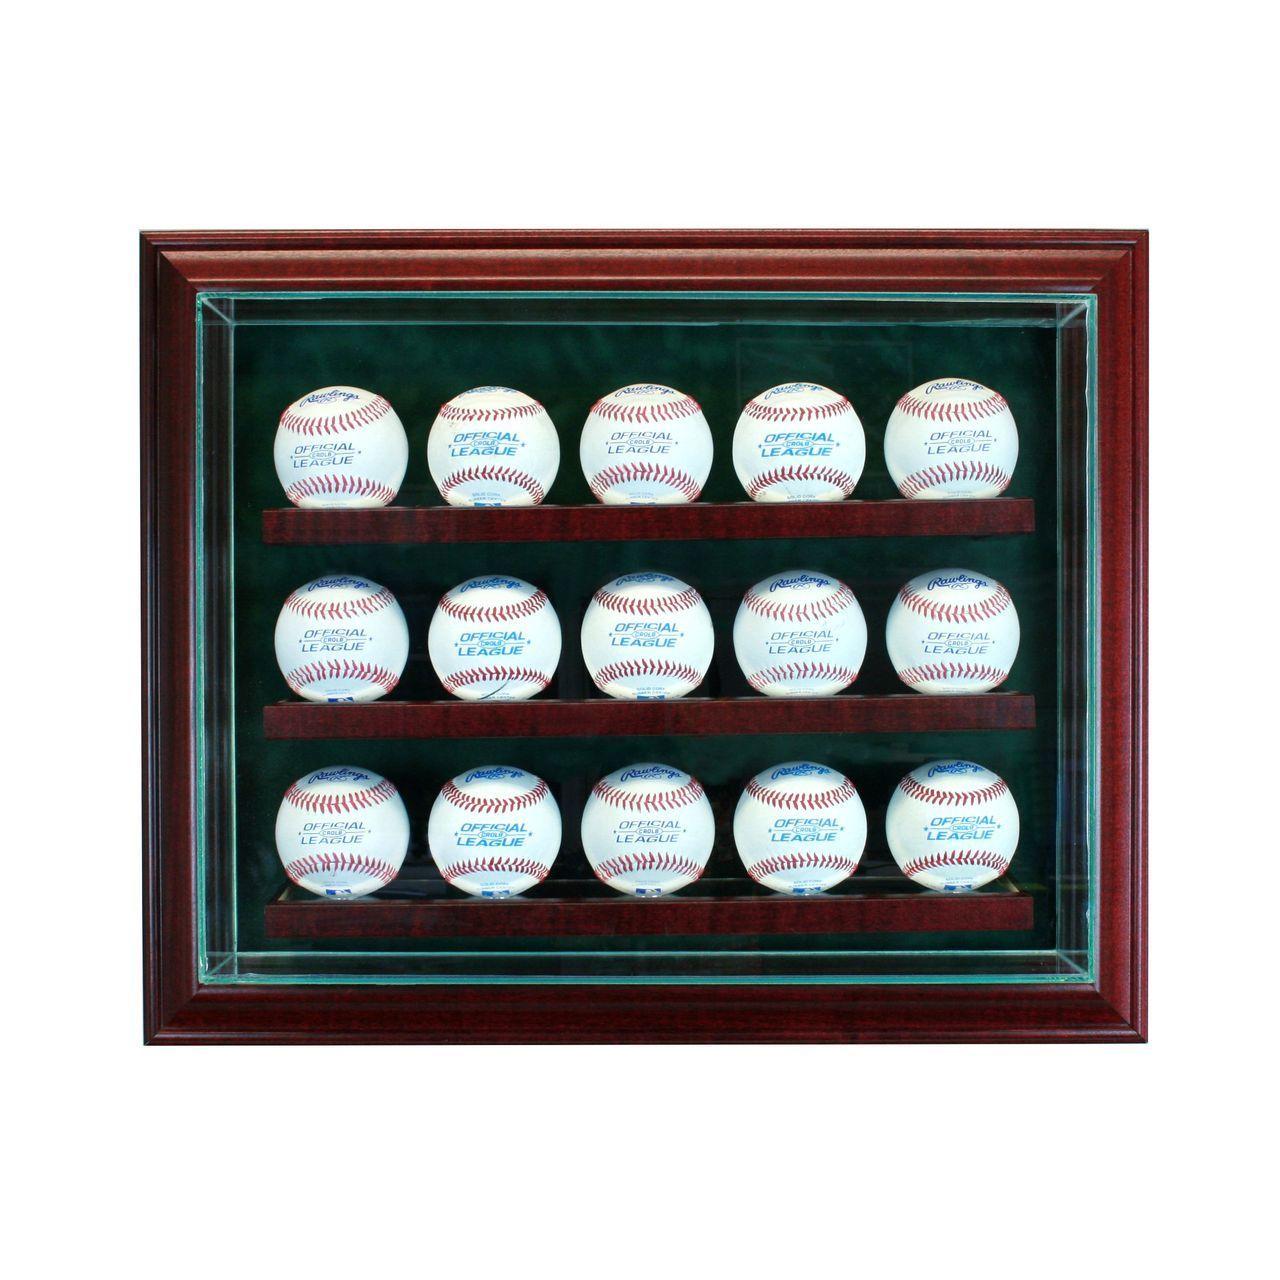 Aaa Sports Memorabilia Llc 15 Baseball Cabinet Style Display Case 199 99 Http